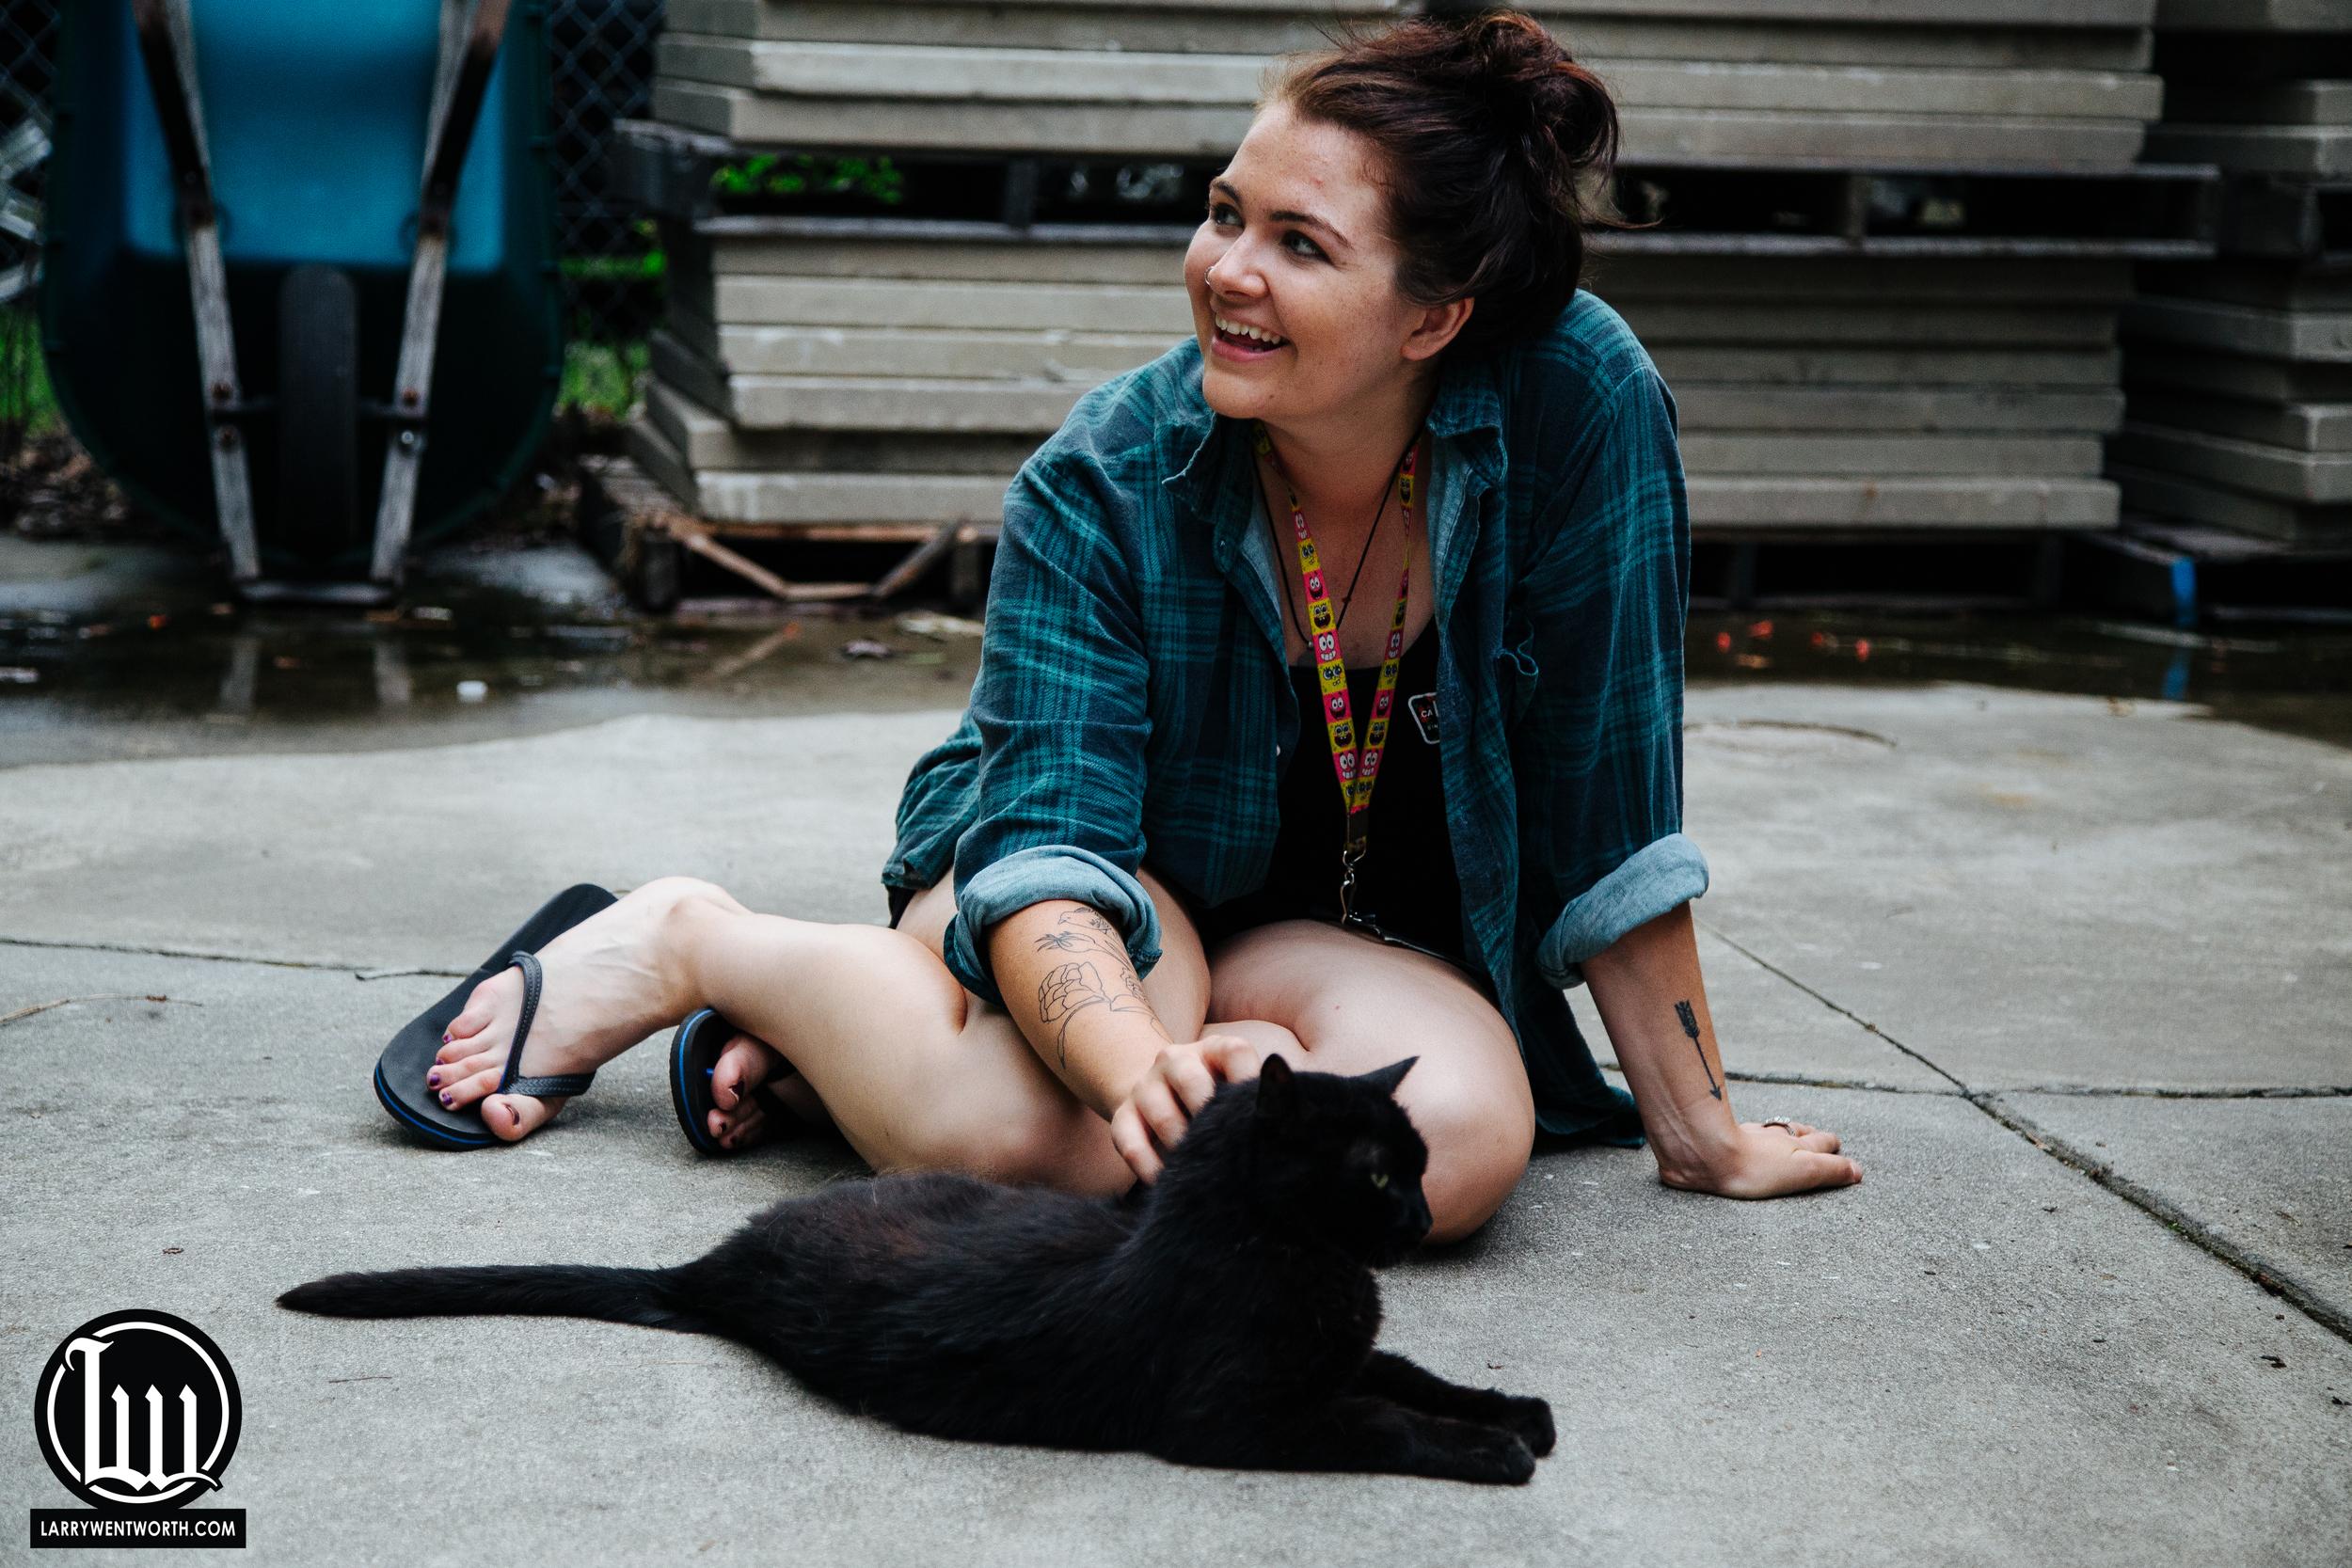 Ashley Osborn and her new friend